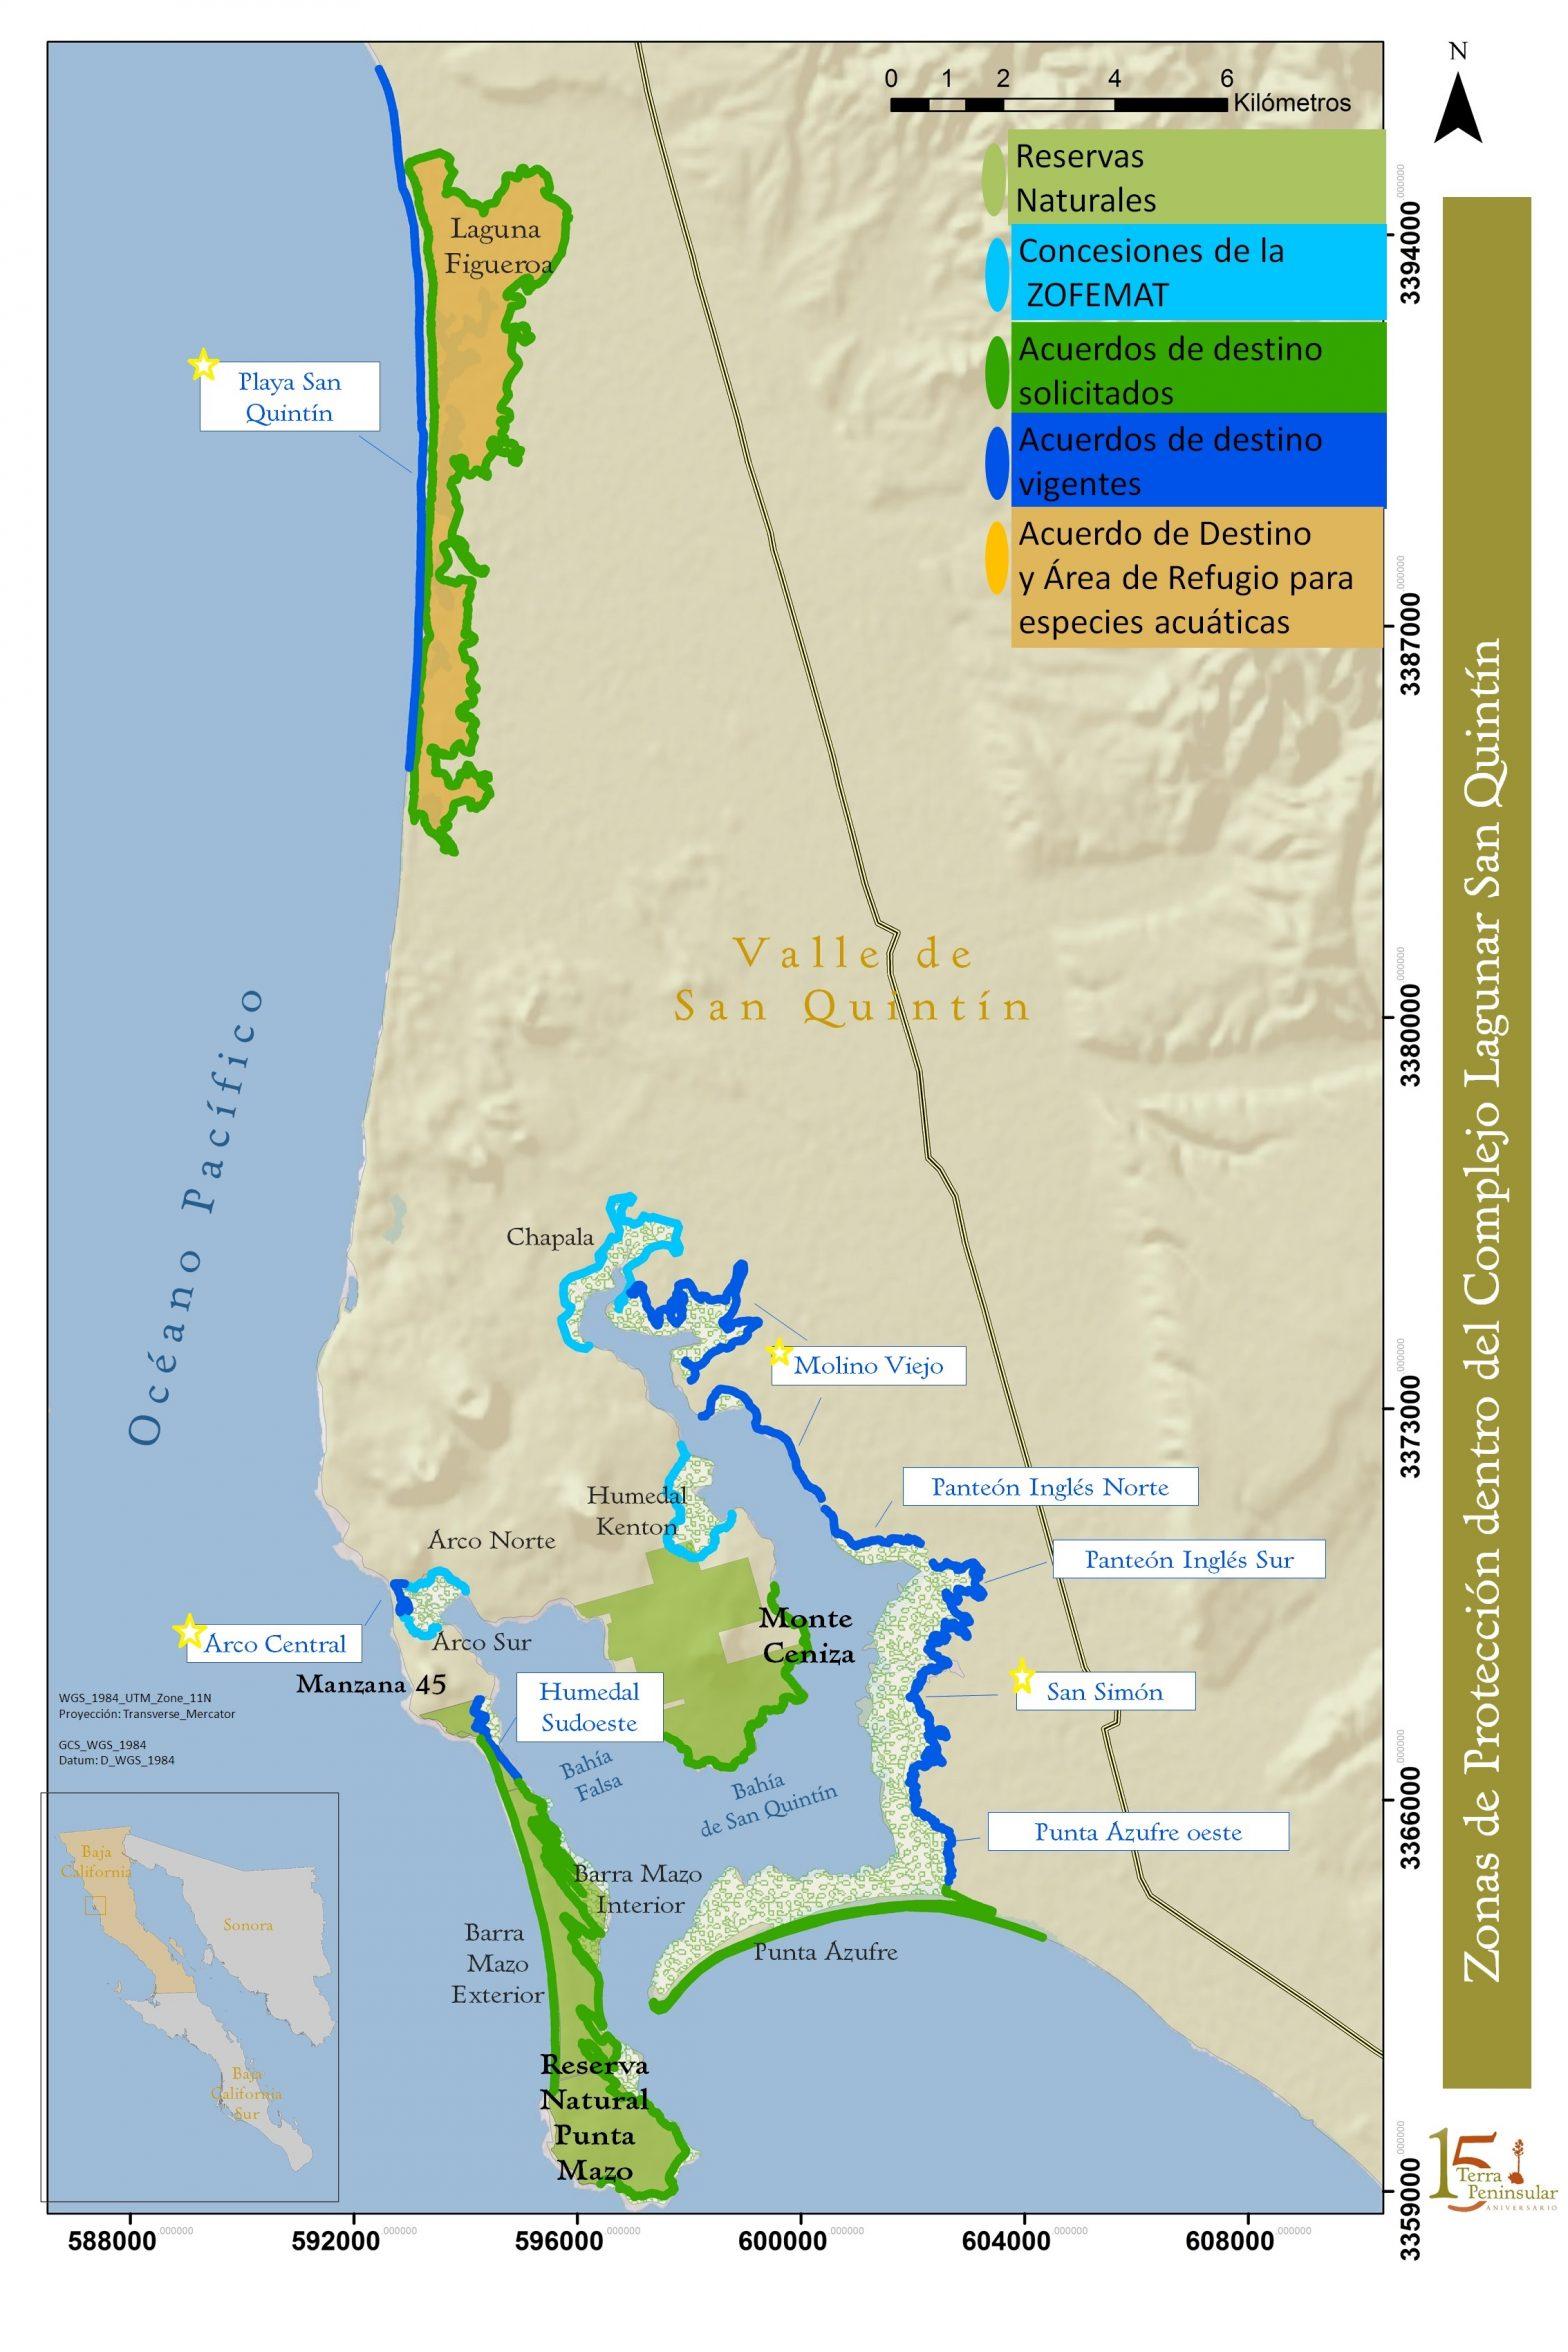 Destination Agreements 2016 in San Quintín Bay